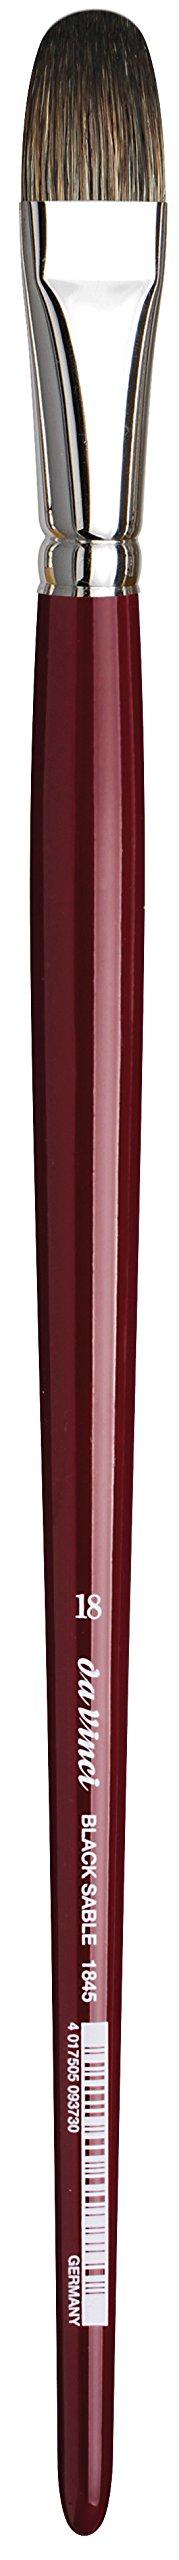 Filbert Russian Black Sable da Vinci Oil /& Acrylic Series 1845 Oil Paint Brush Size 4